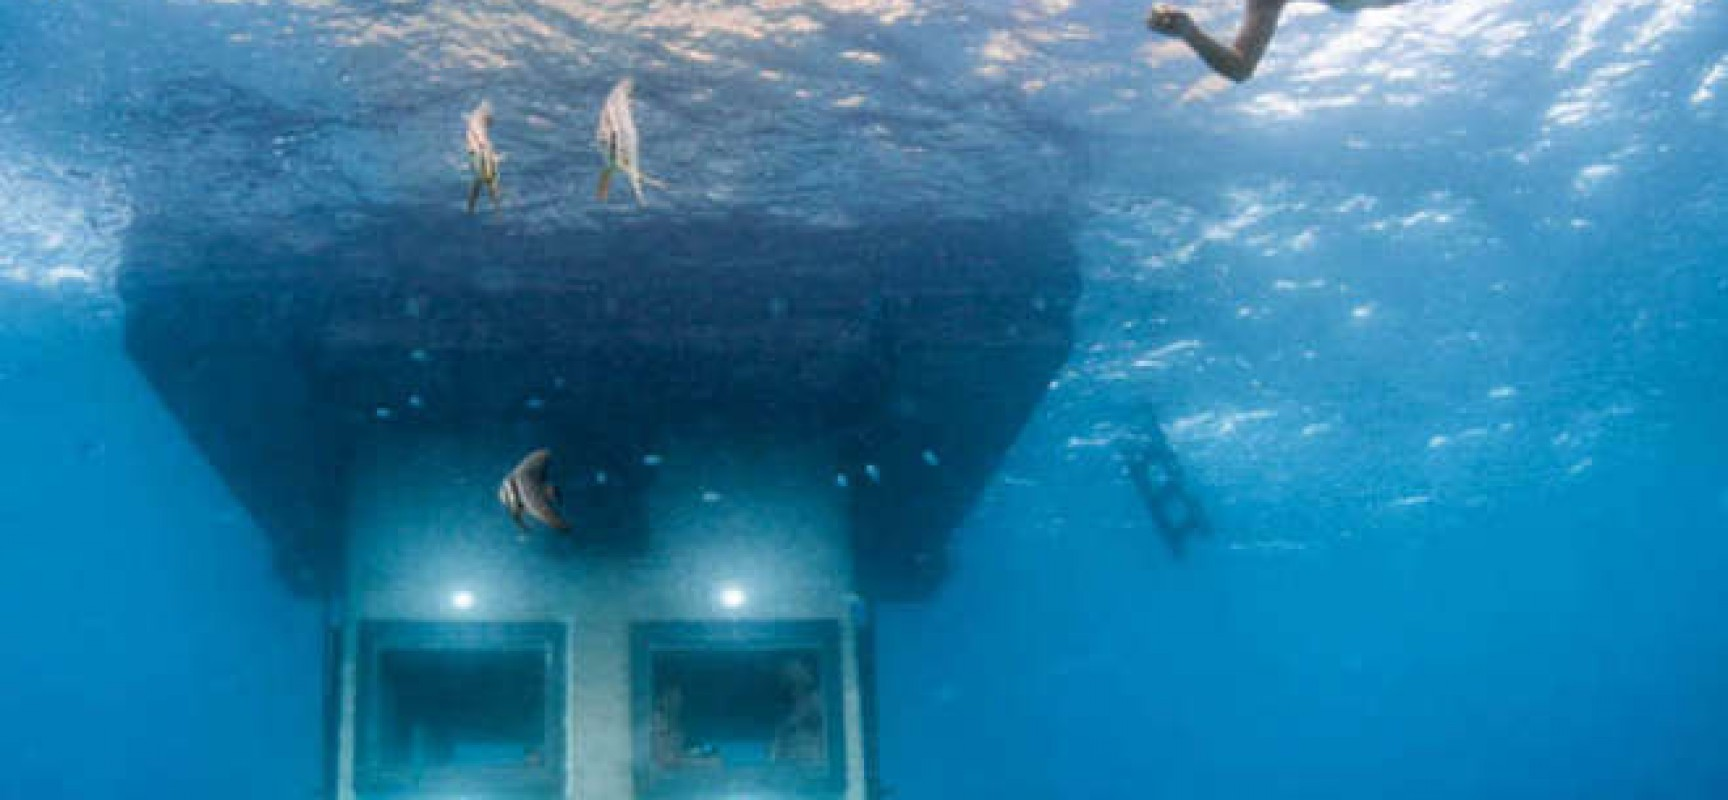 hotel sott acqua foto gallery